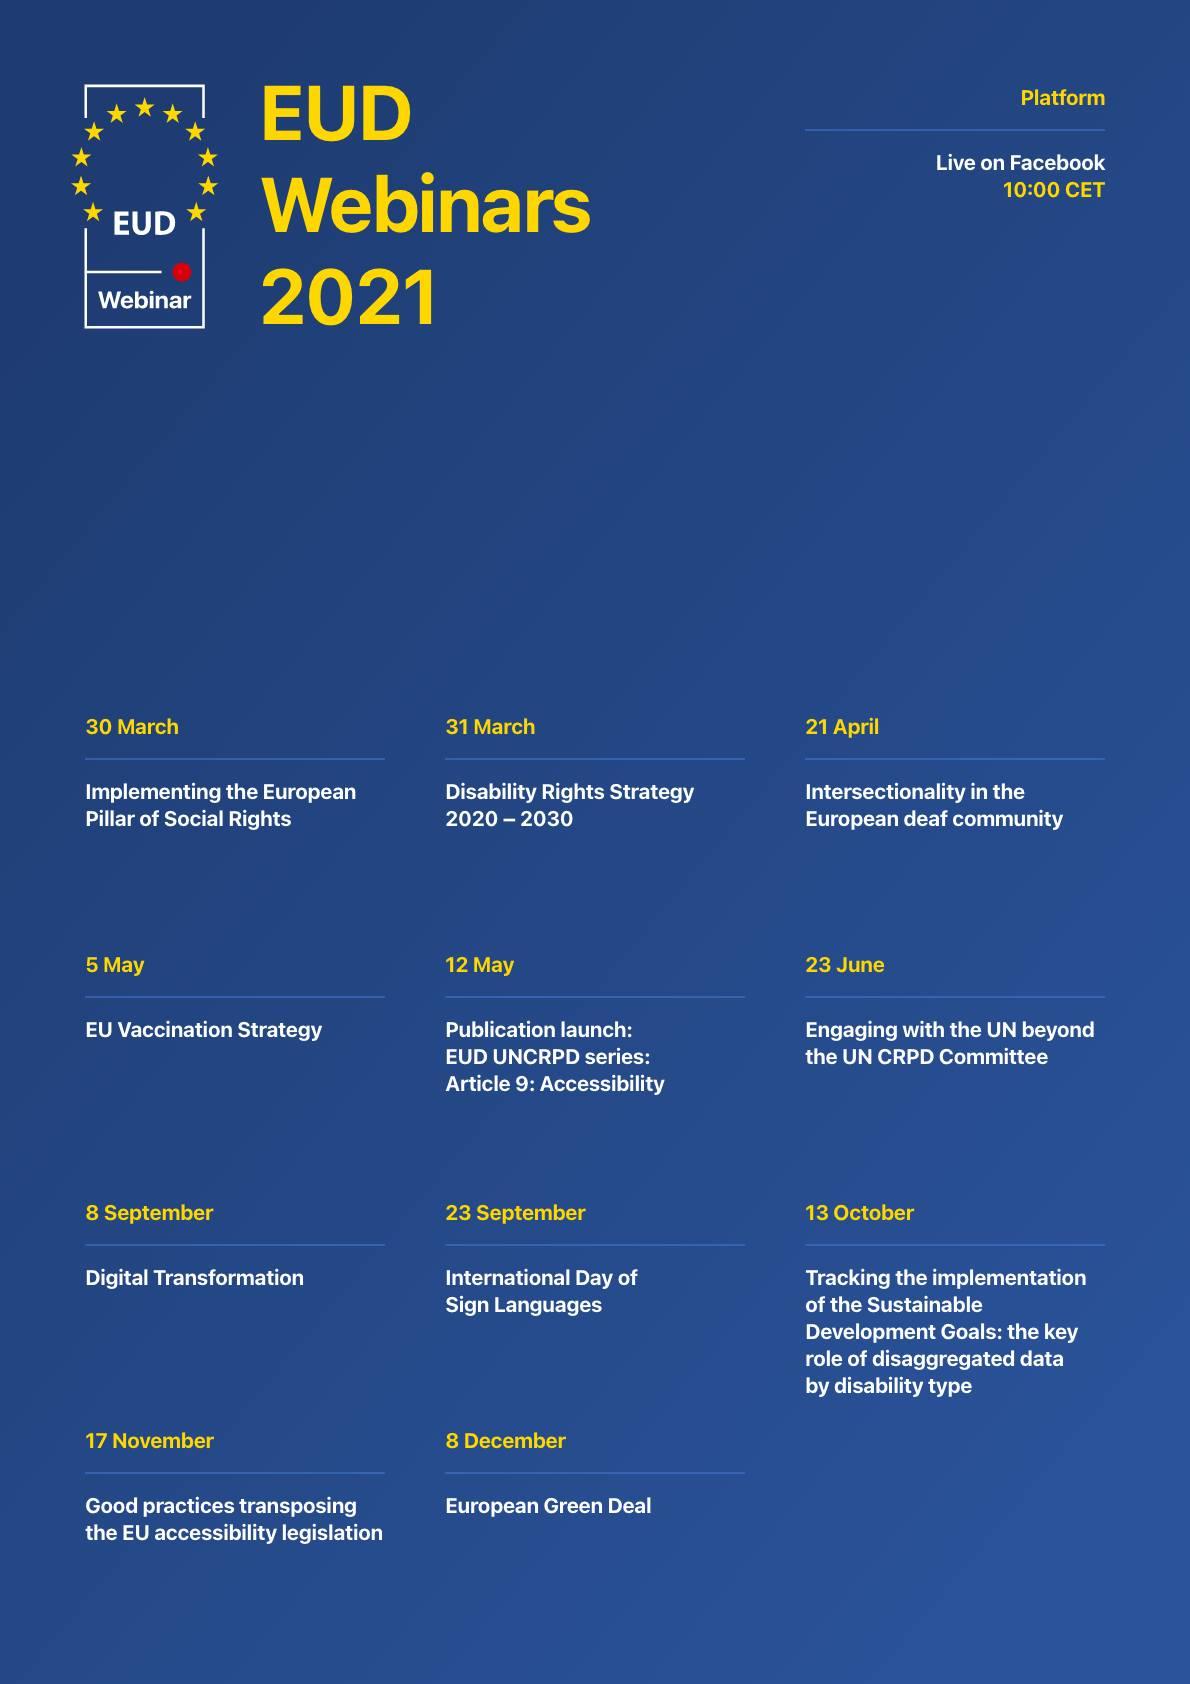 EUD Webinars 2021